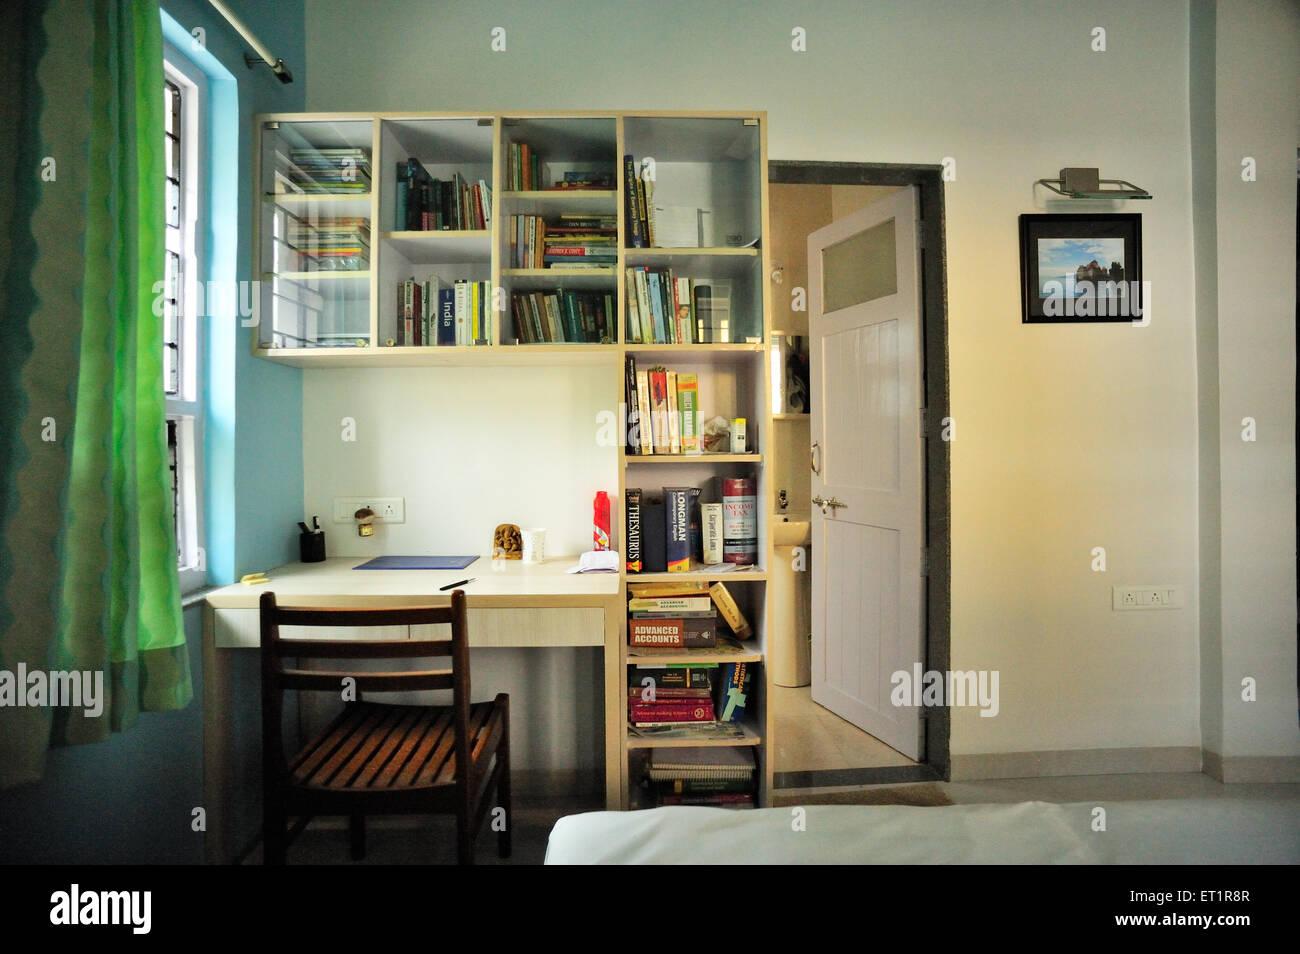 Study room - Stock Image